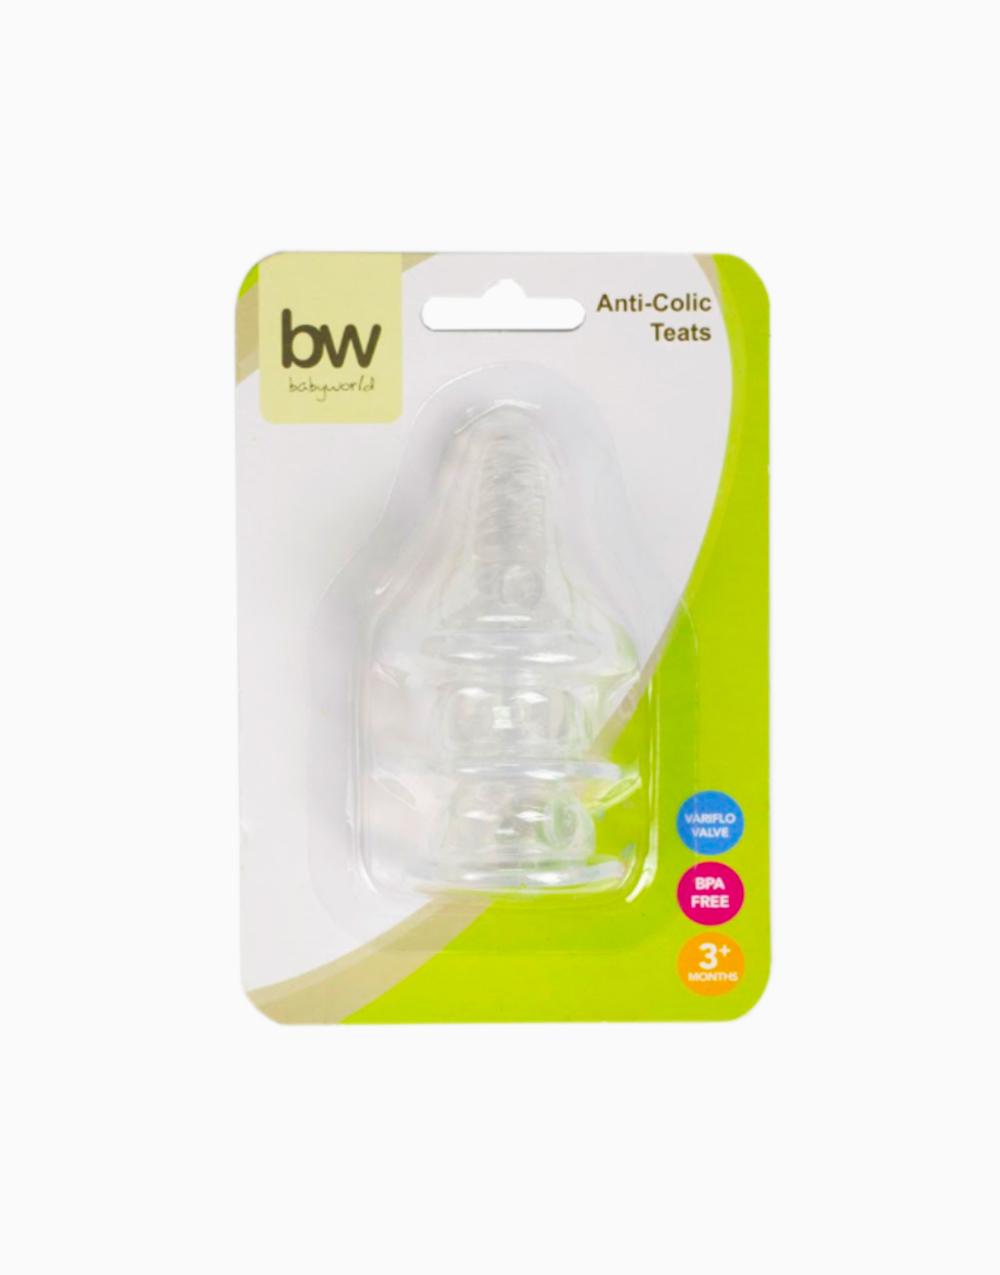 BW Anti-Colic Teats 3 pcs (17) by BabyWorld PH